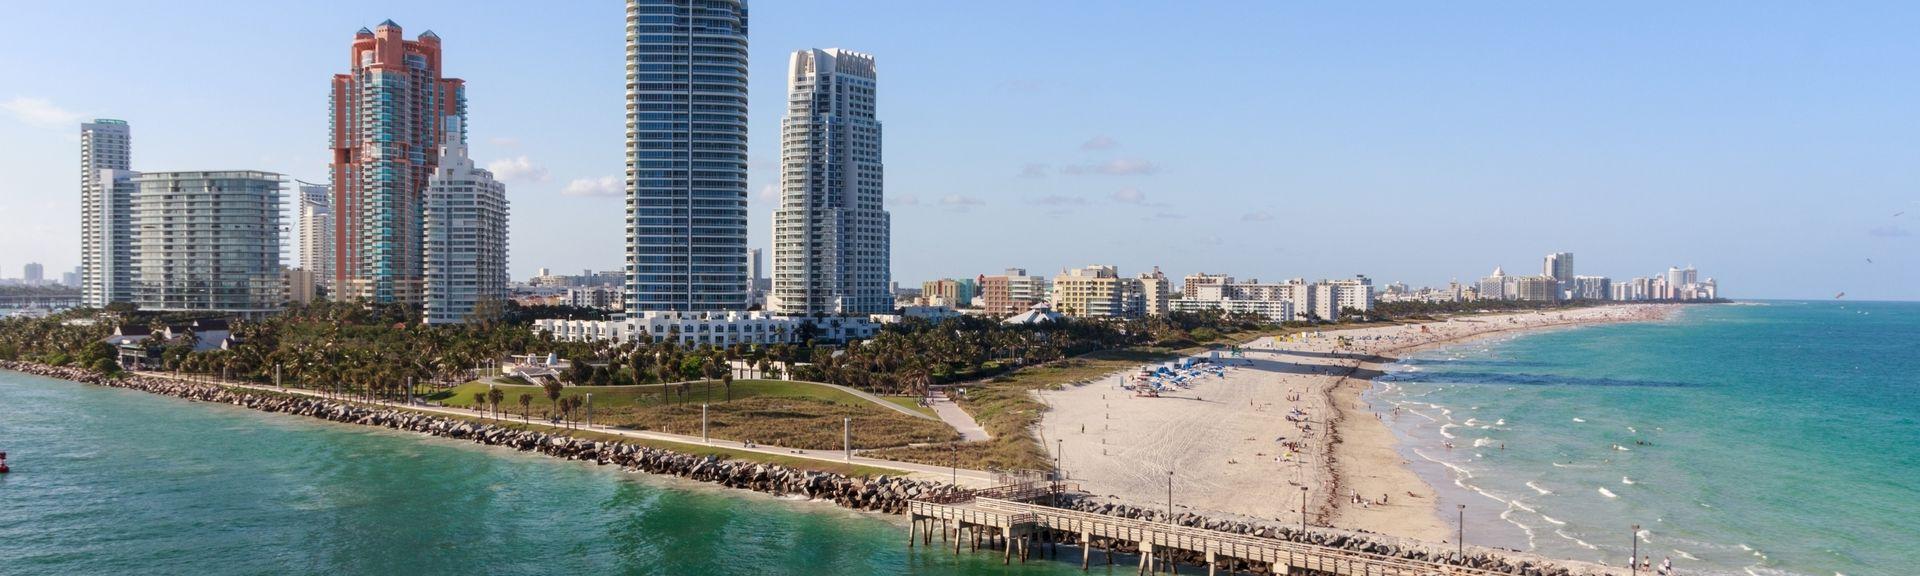 Pensacola Beach Vacation Als